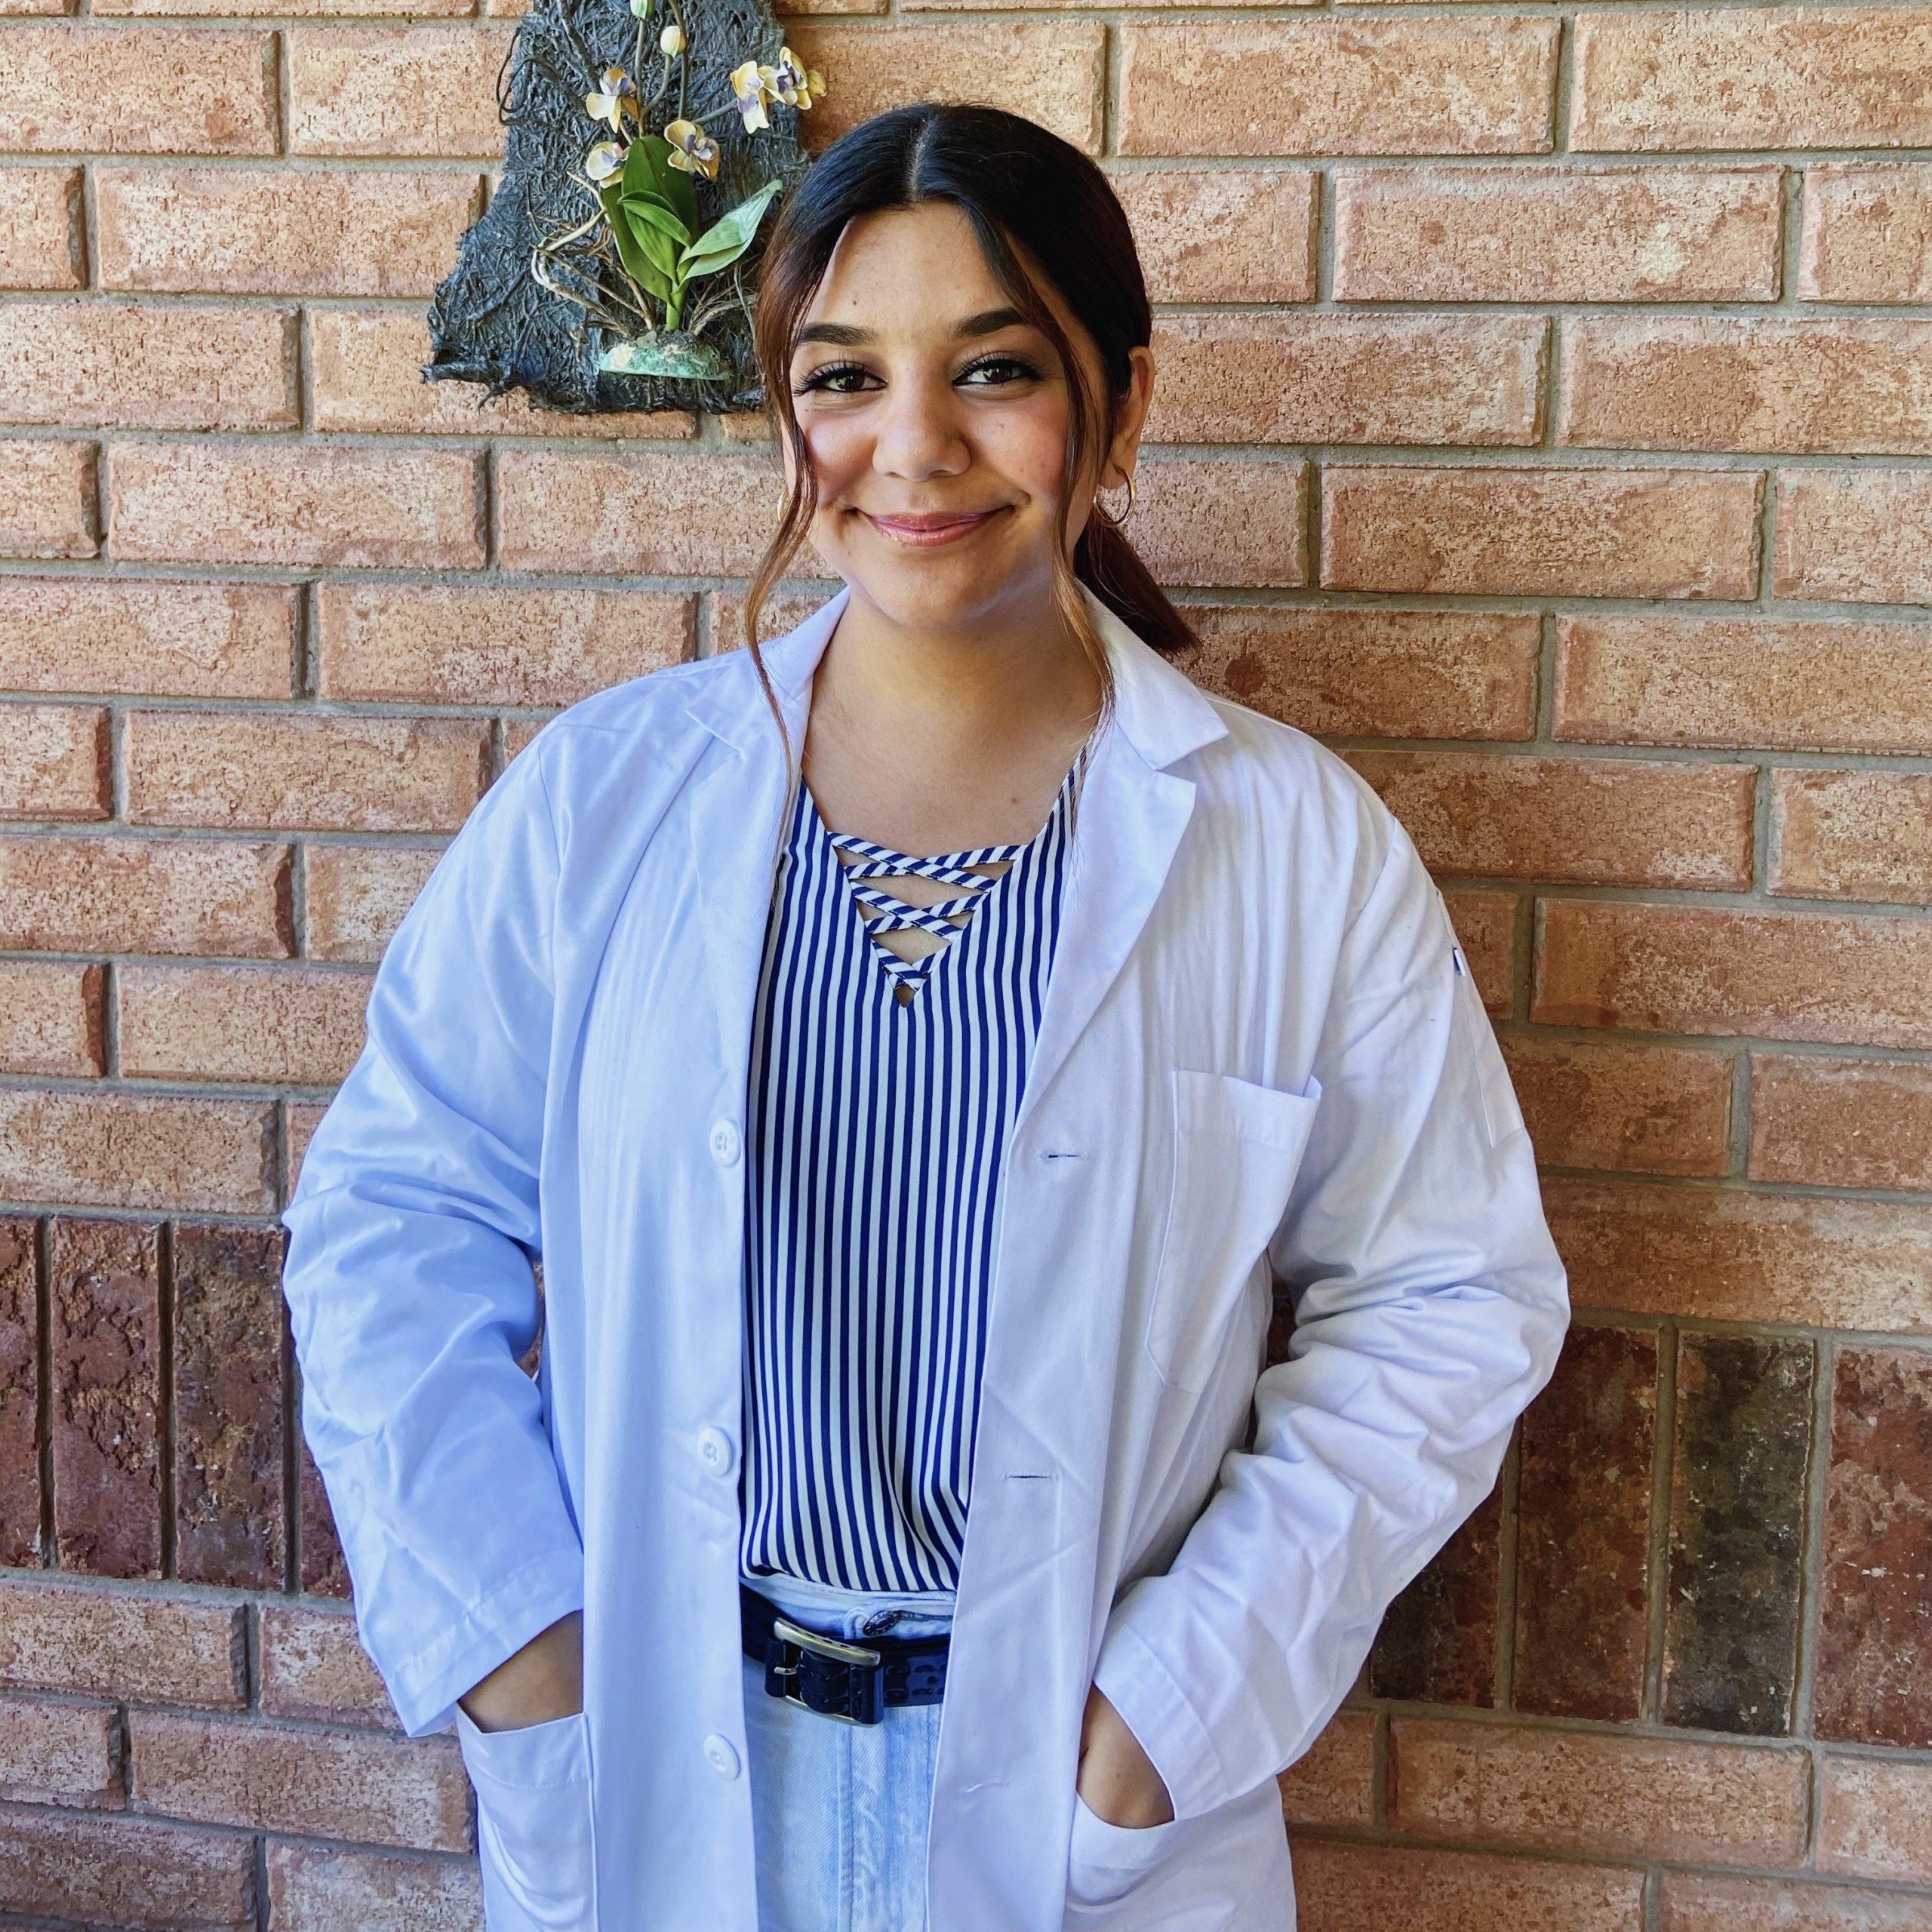 Student Aleeza Qayyum